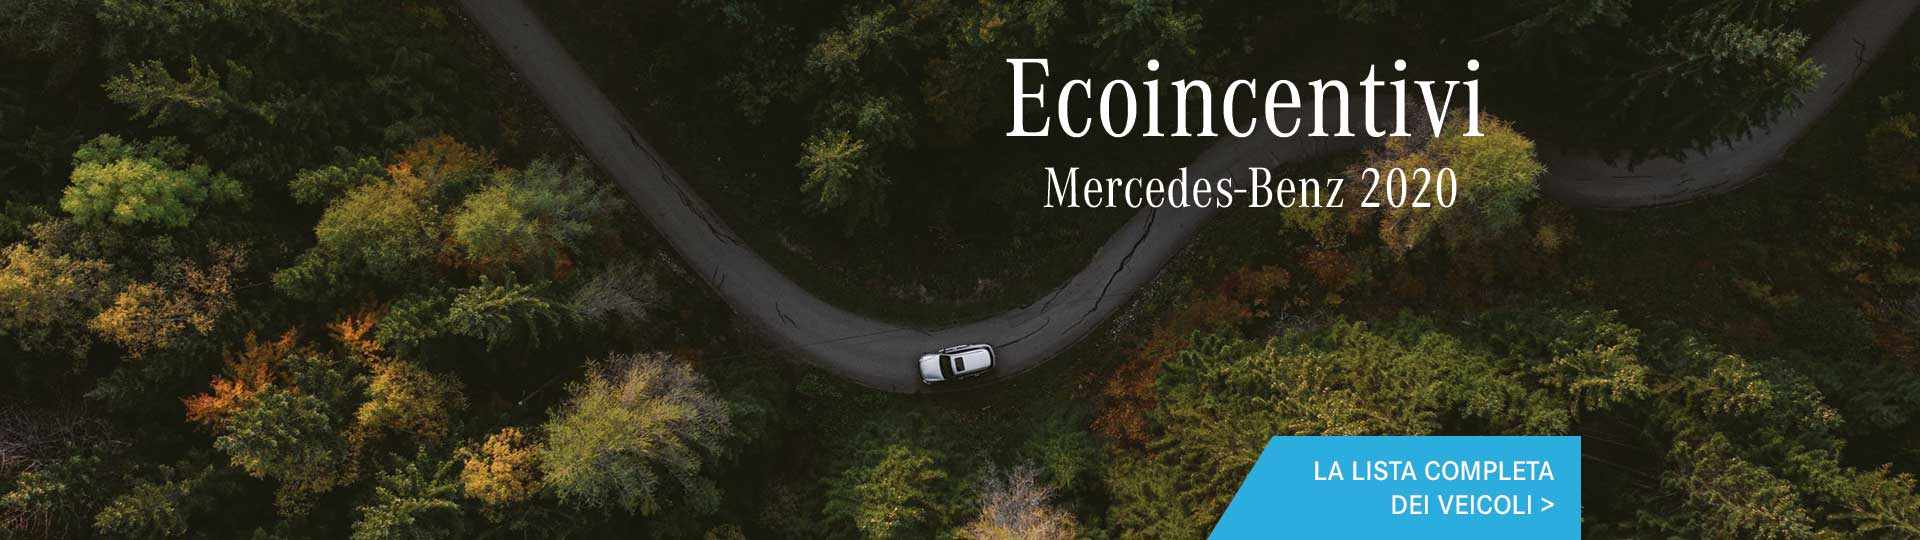 header_ecoincentivi_mercedes_agosto_2020.jpg